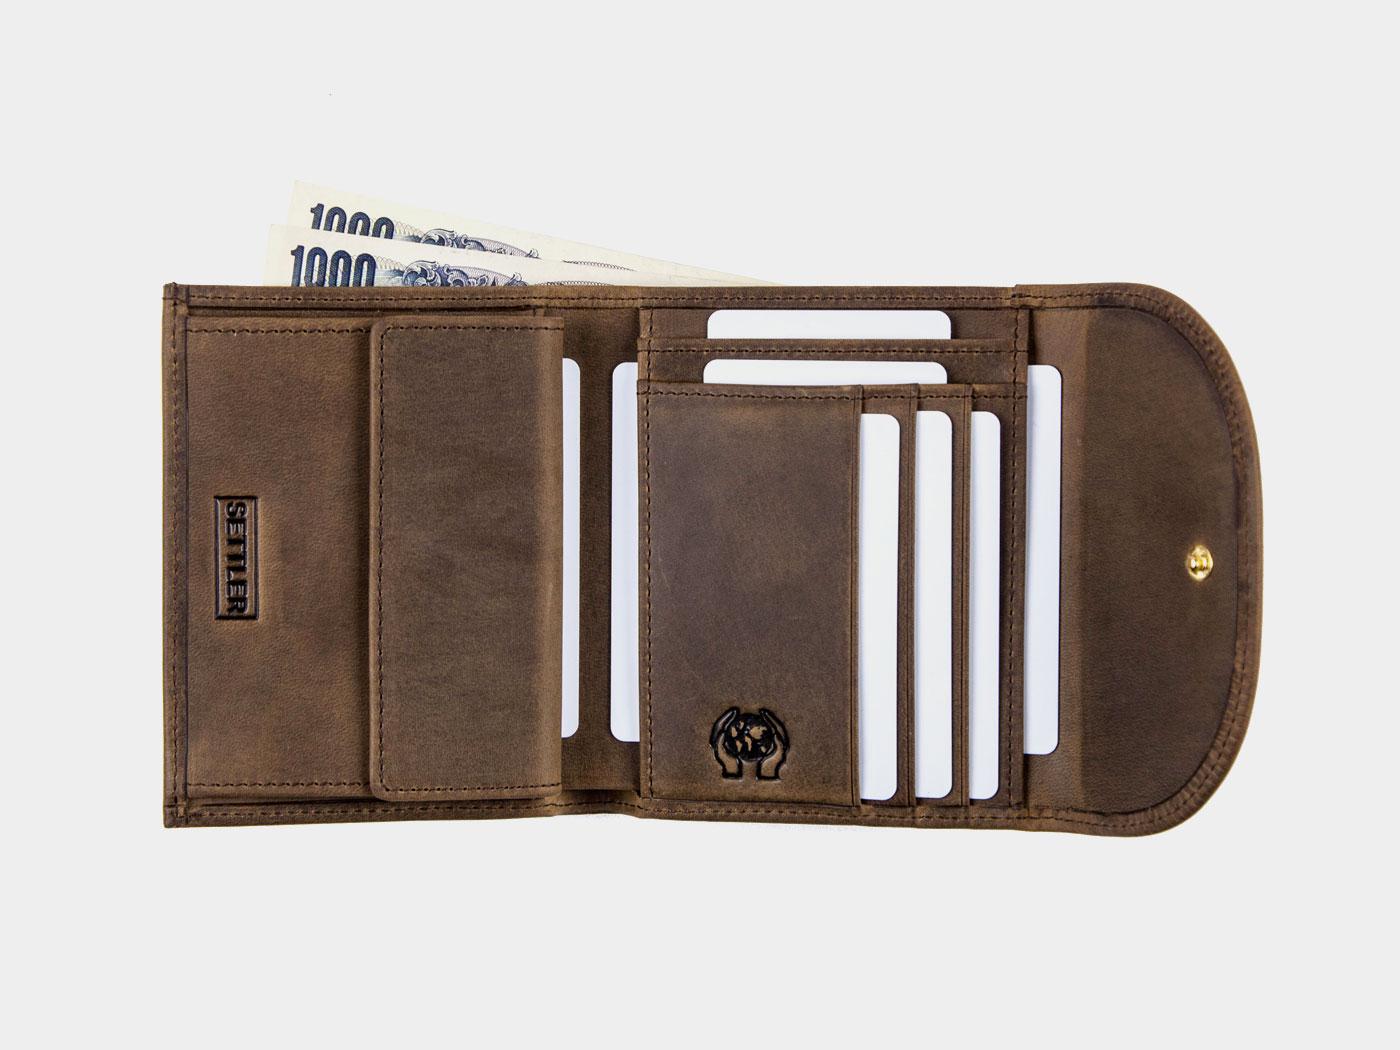 setller セトラー ow1058 small 3fold wallet 三つ折り財布 カウハイド